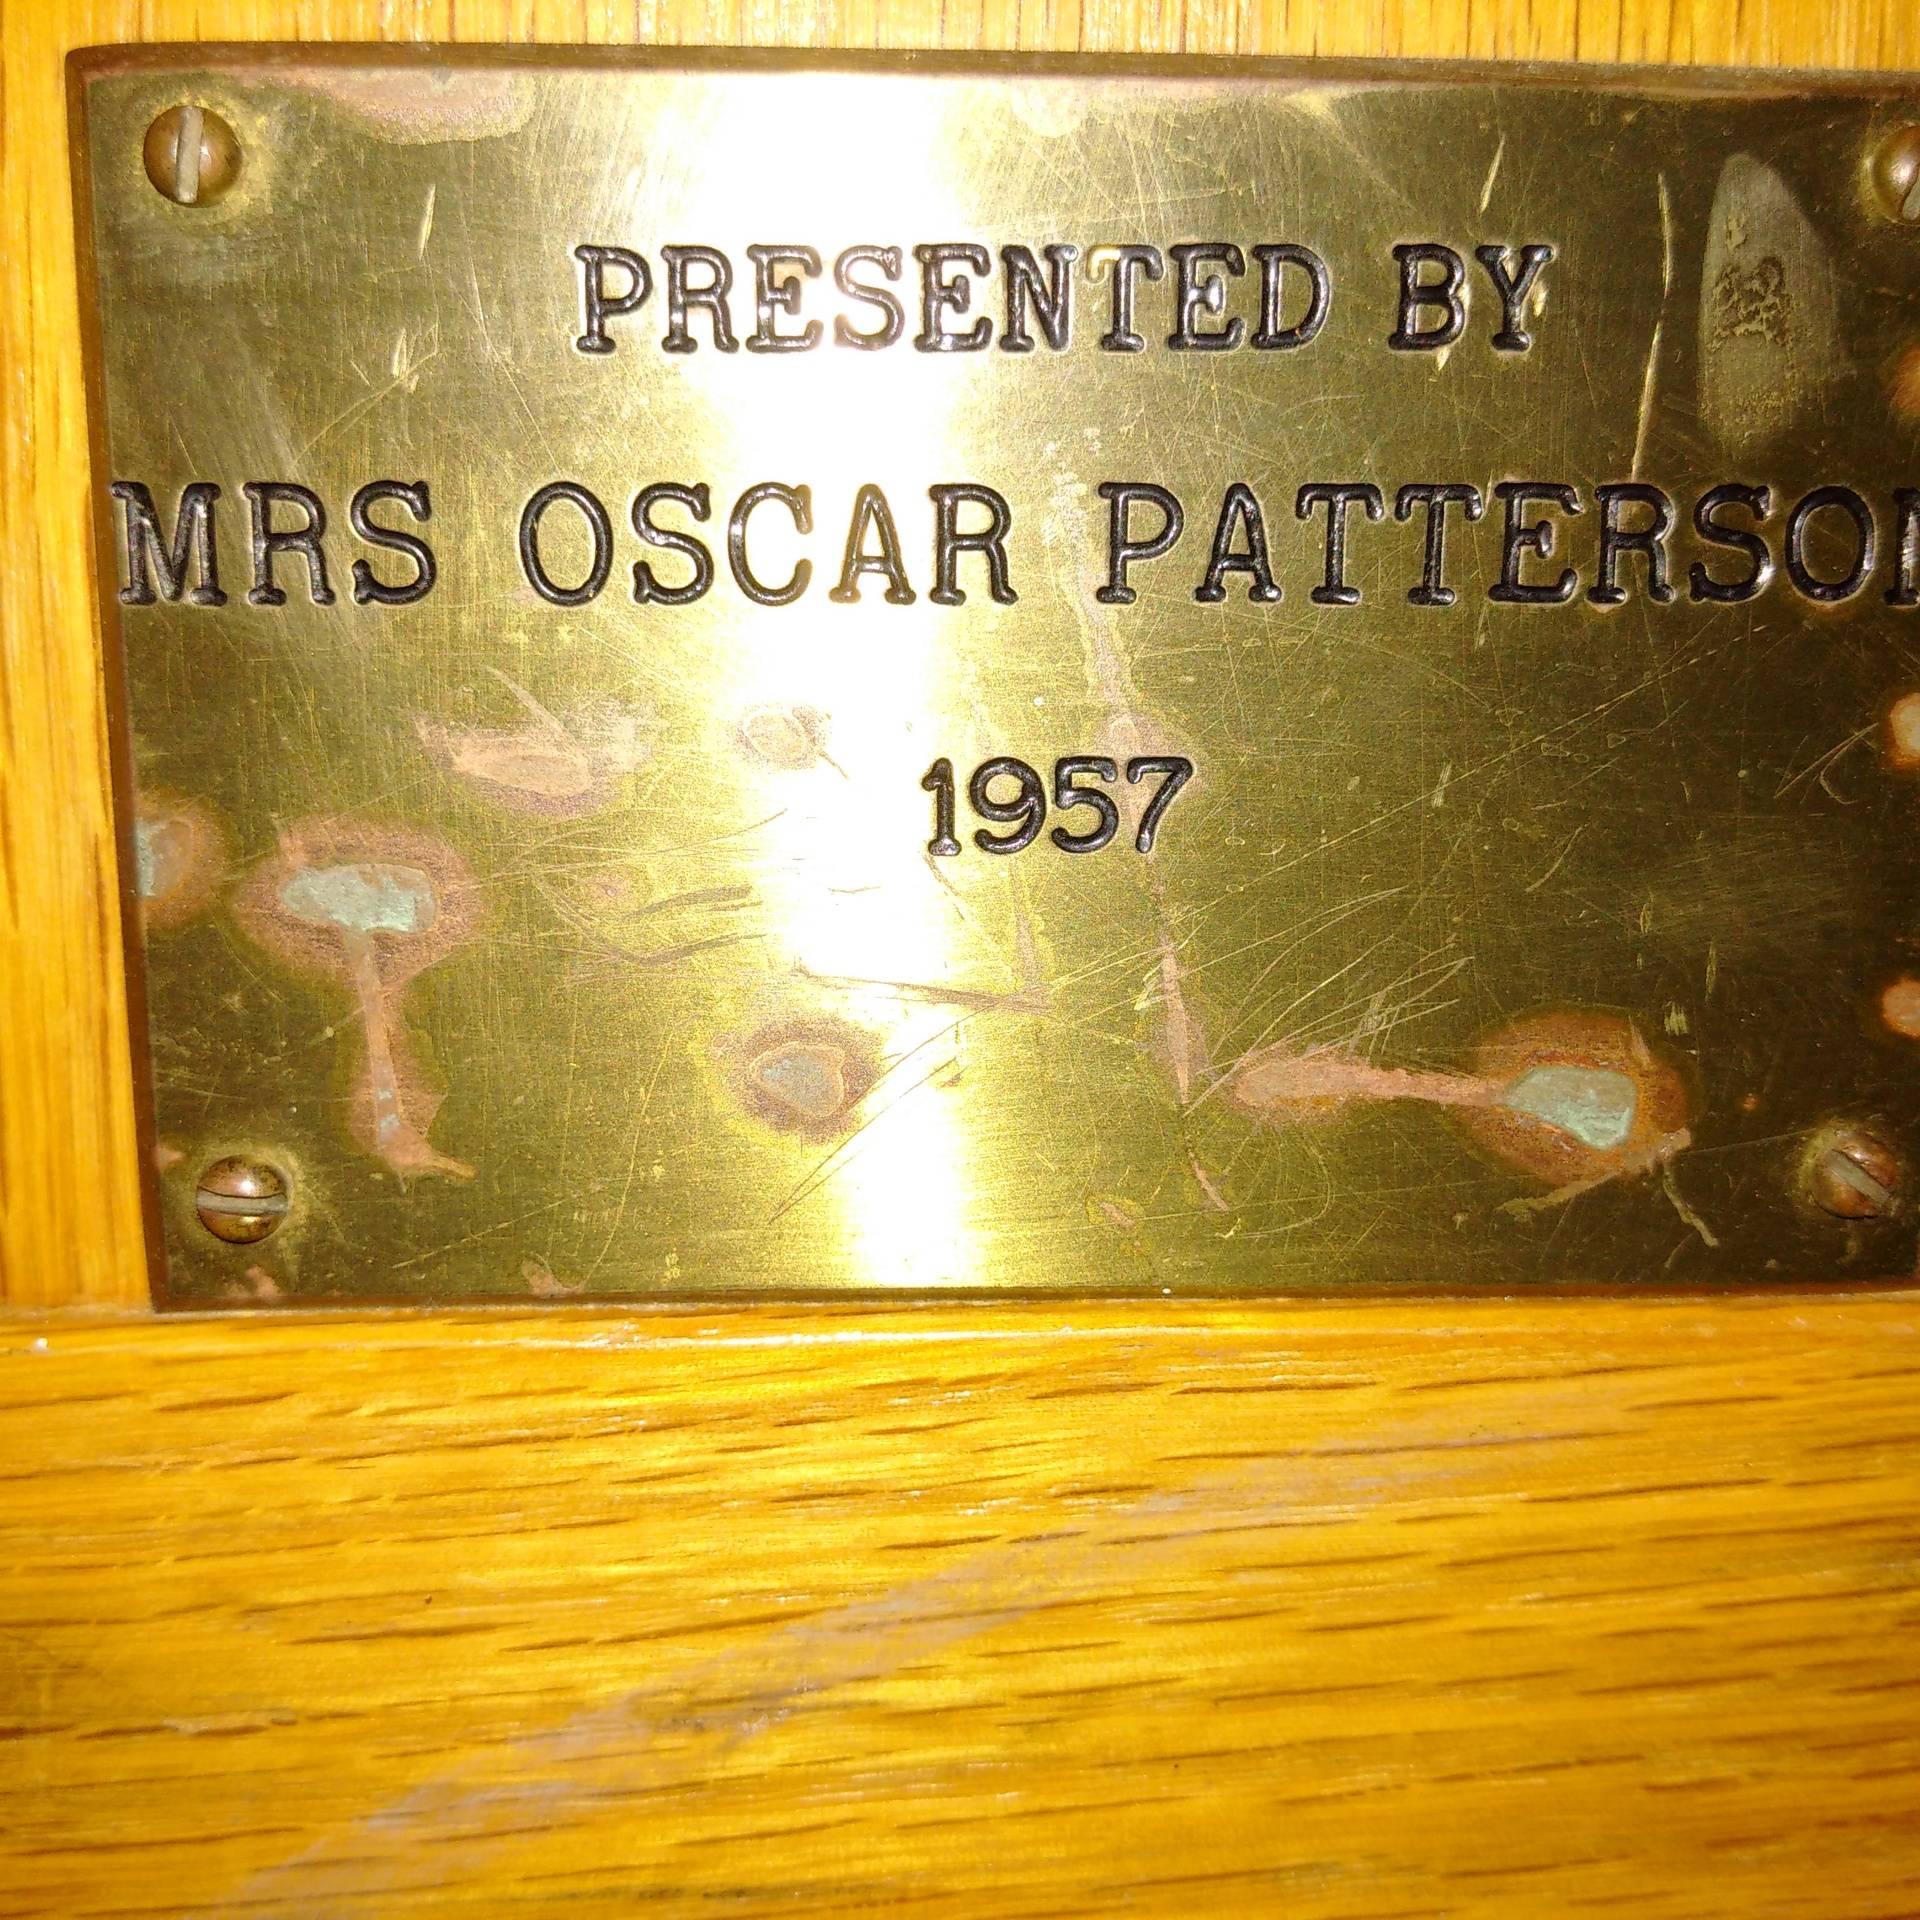 Mrs. Oscar Patterson 1957